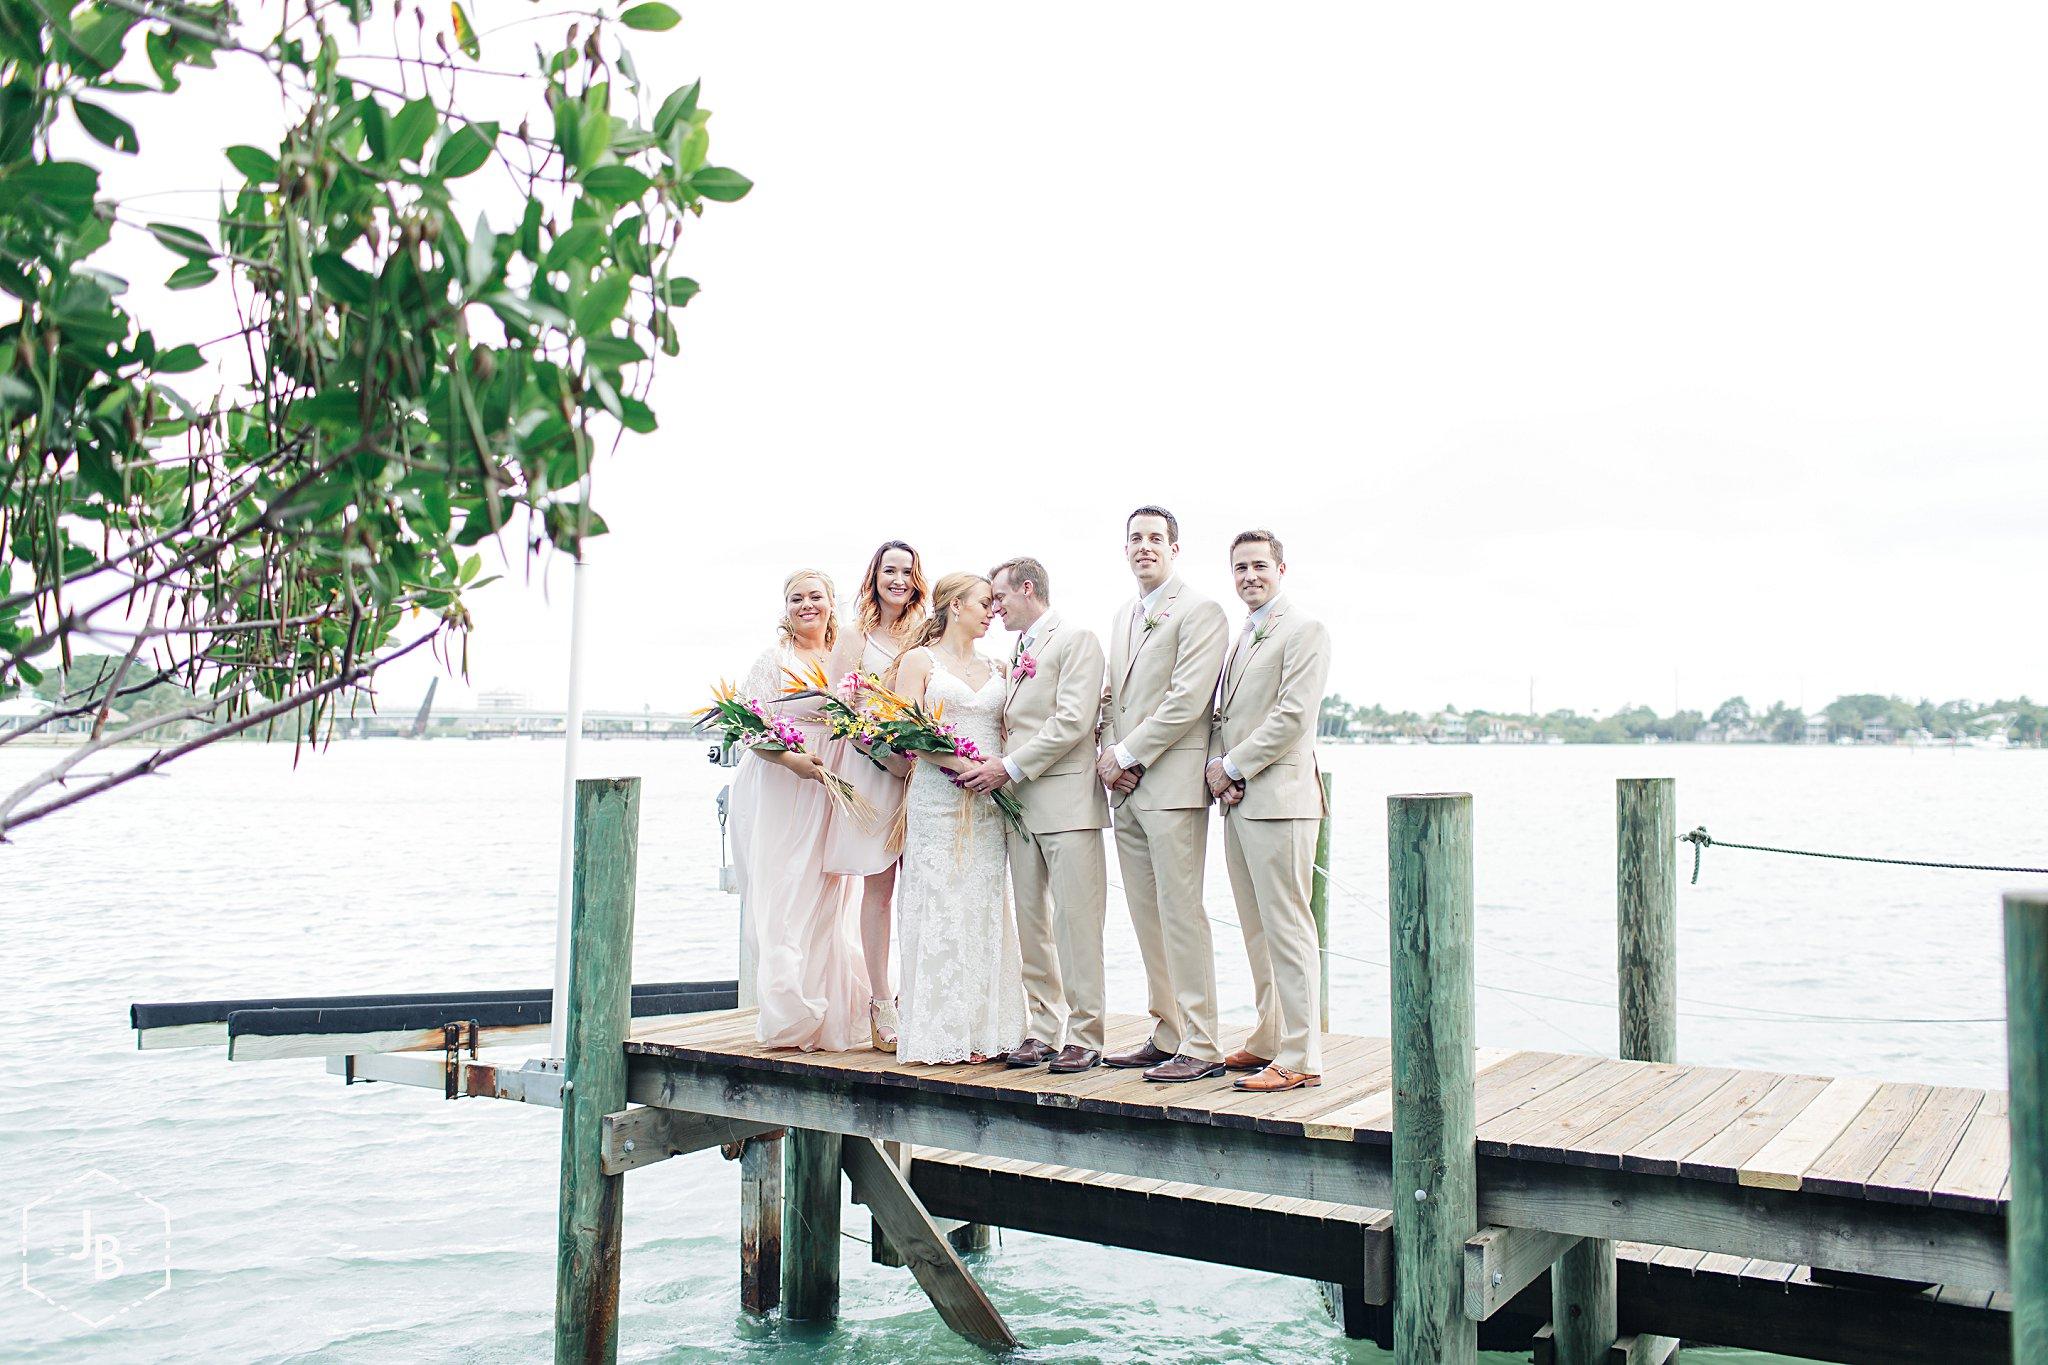 WeddingandEngagementFloridaPhotographer_2058.jpg